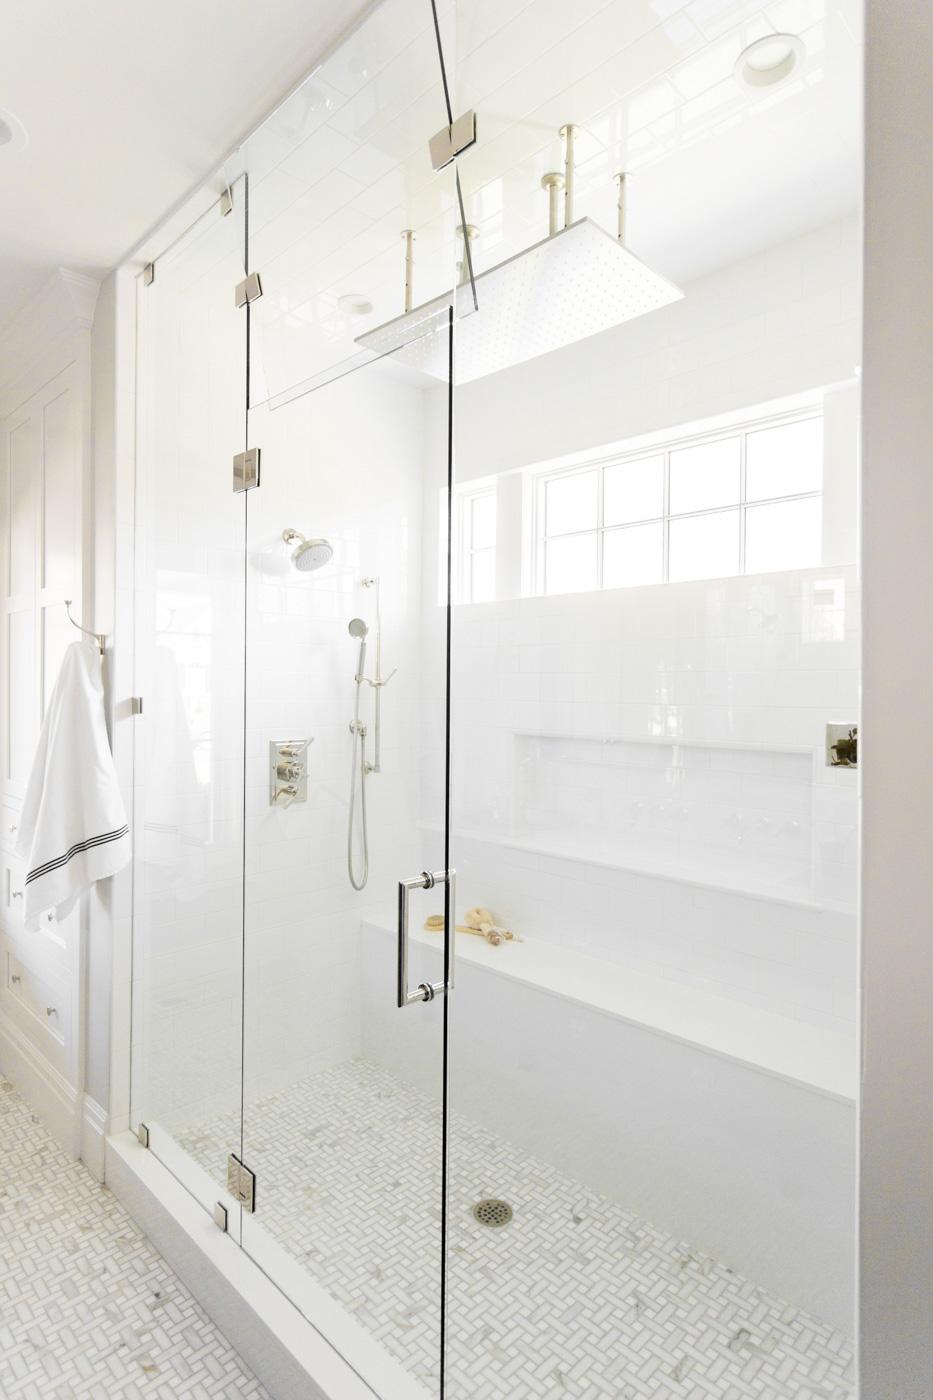 Shower+details+||+Studio+McGee.jpg